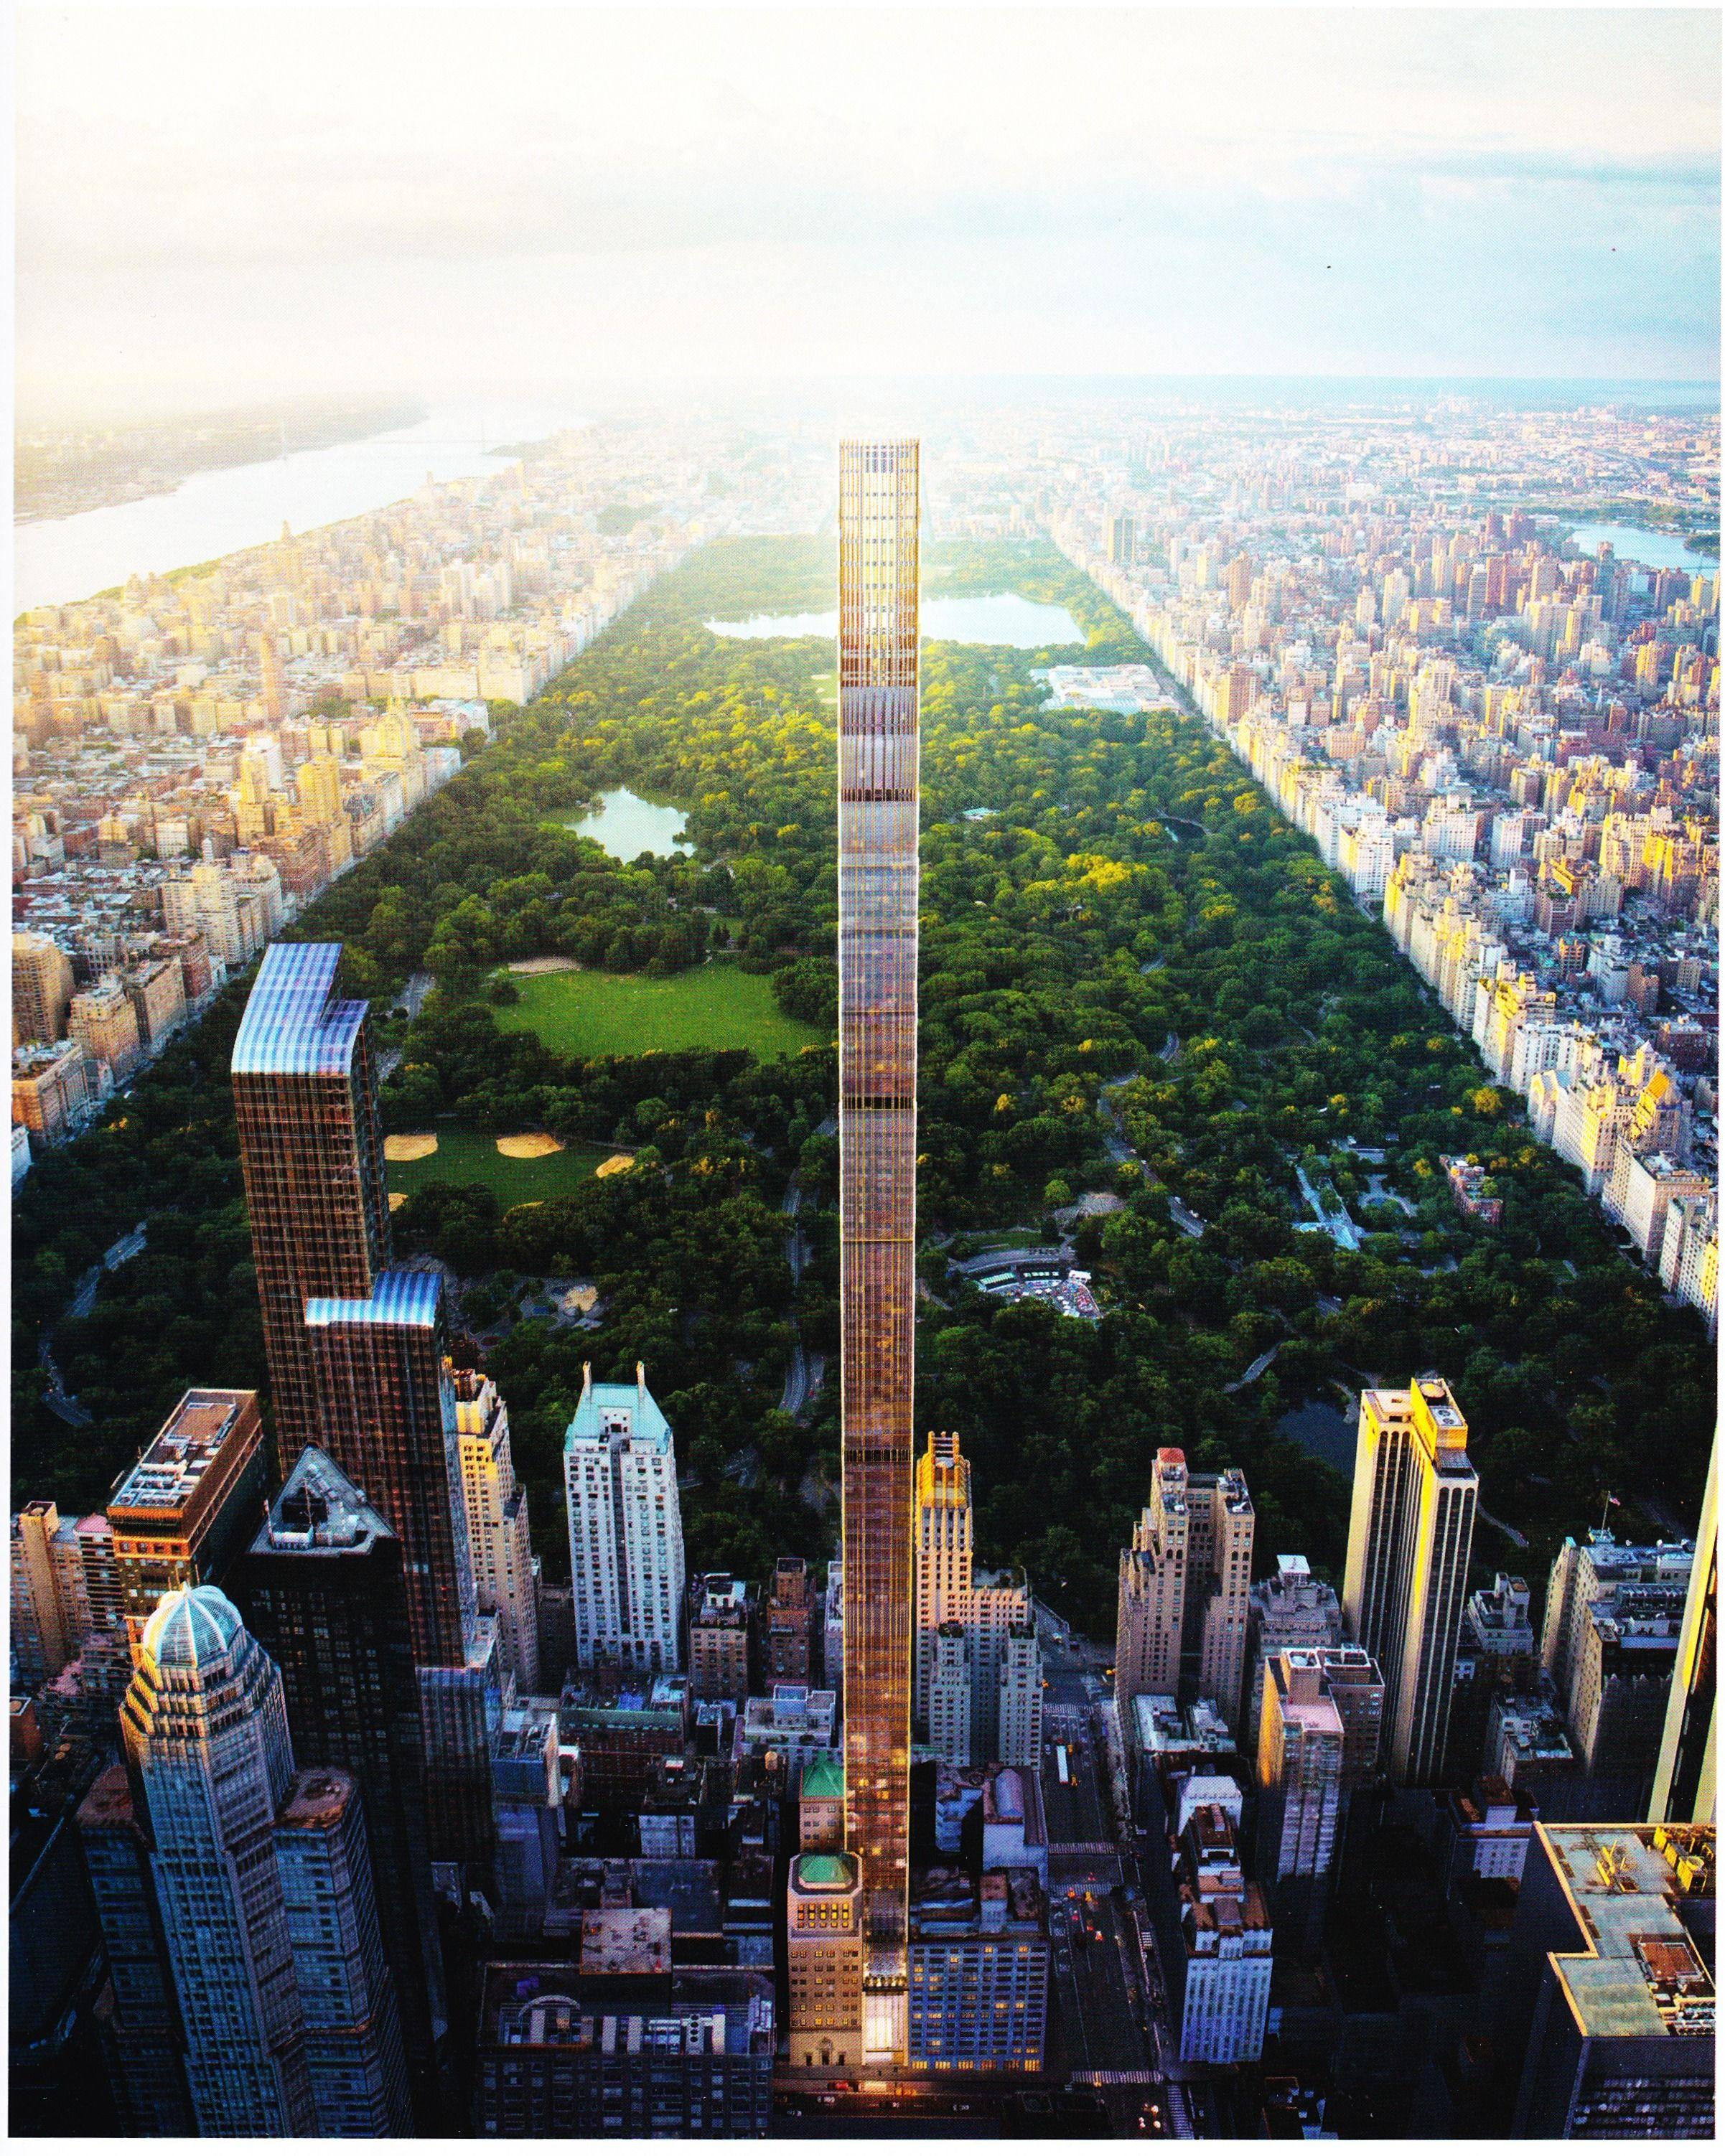 York 111 West 57th Street - Steinway Tower 433m 1421ft 95 Fl Prep Gina 82